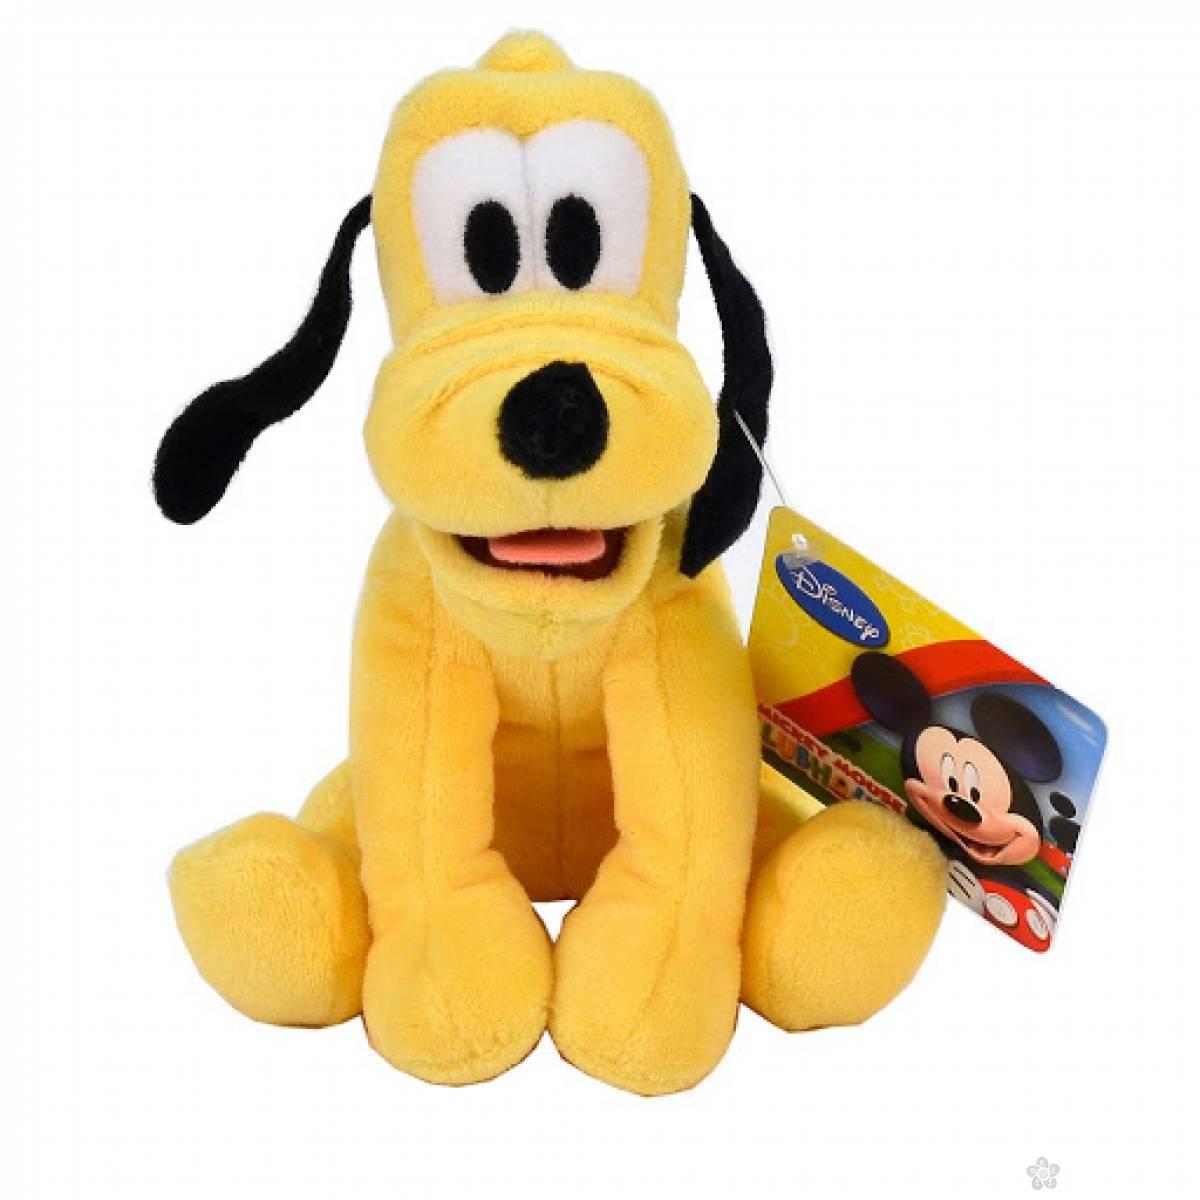 Plišana igračka Pluton 20cm